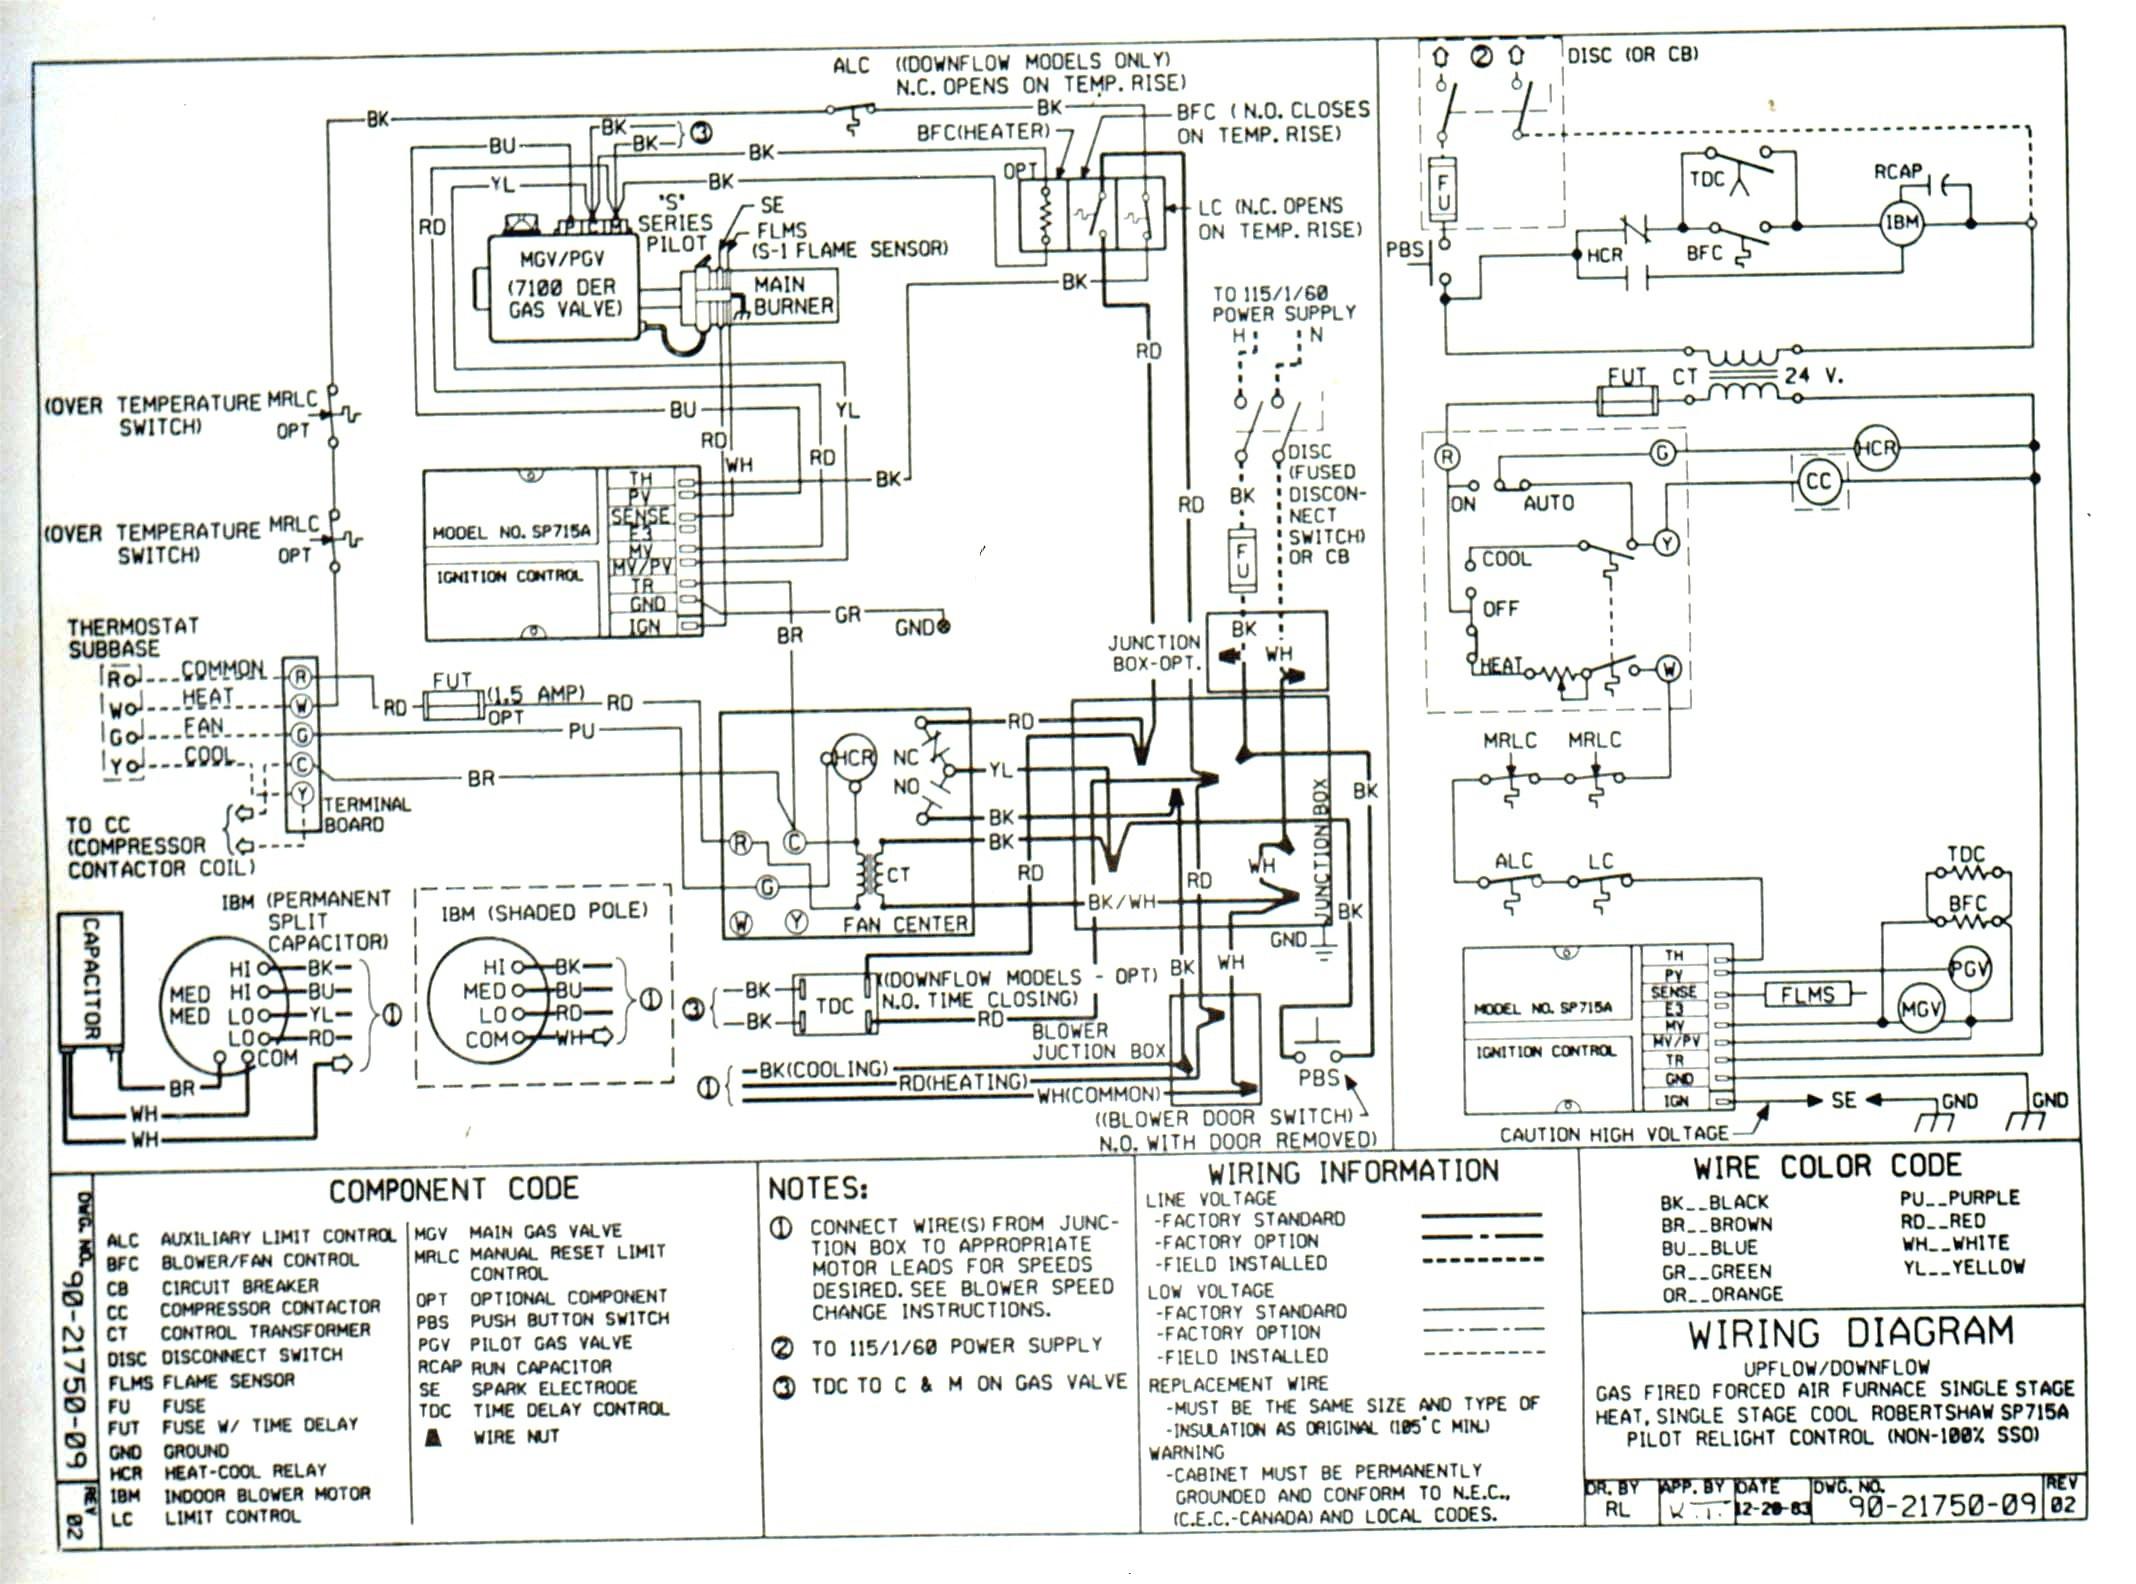 AC Propulsion wiring diagram